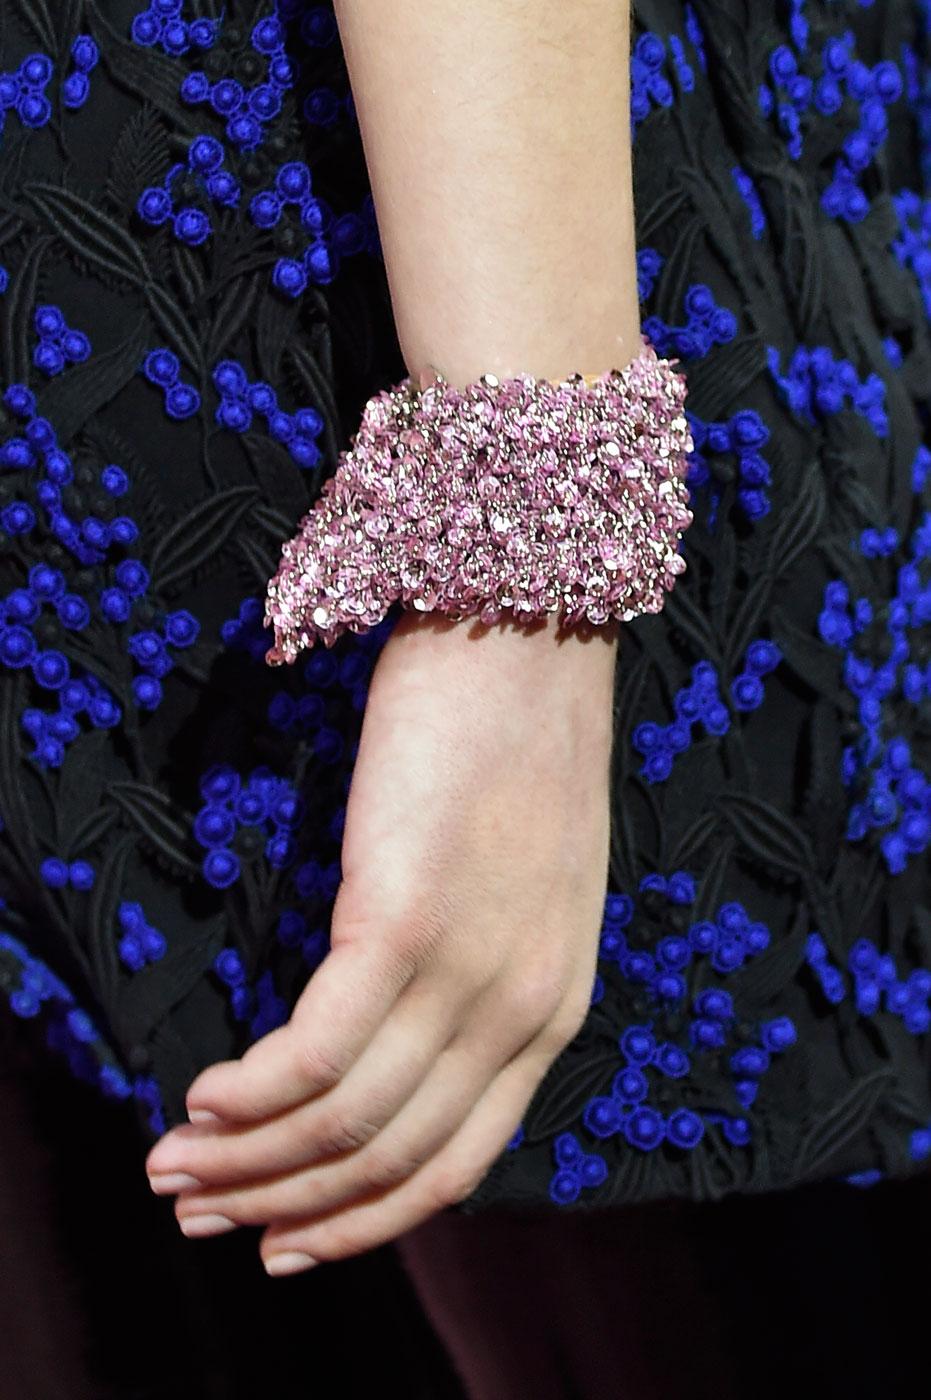 Christian-Dior-fashion-runway-show-close-ups-haute-couture-paris-spring-summer-2015-the-impression-041